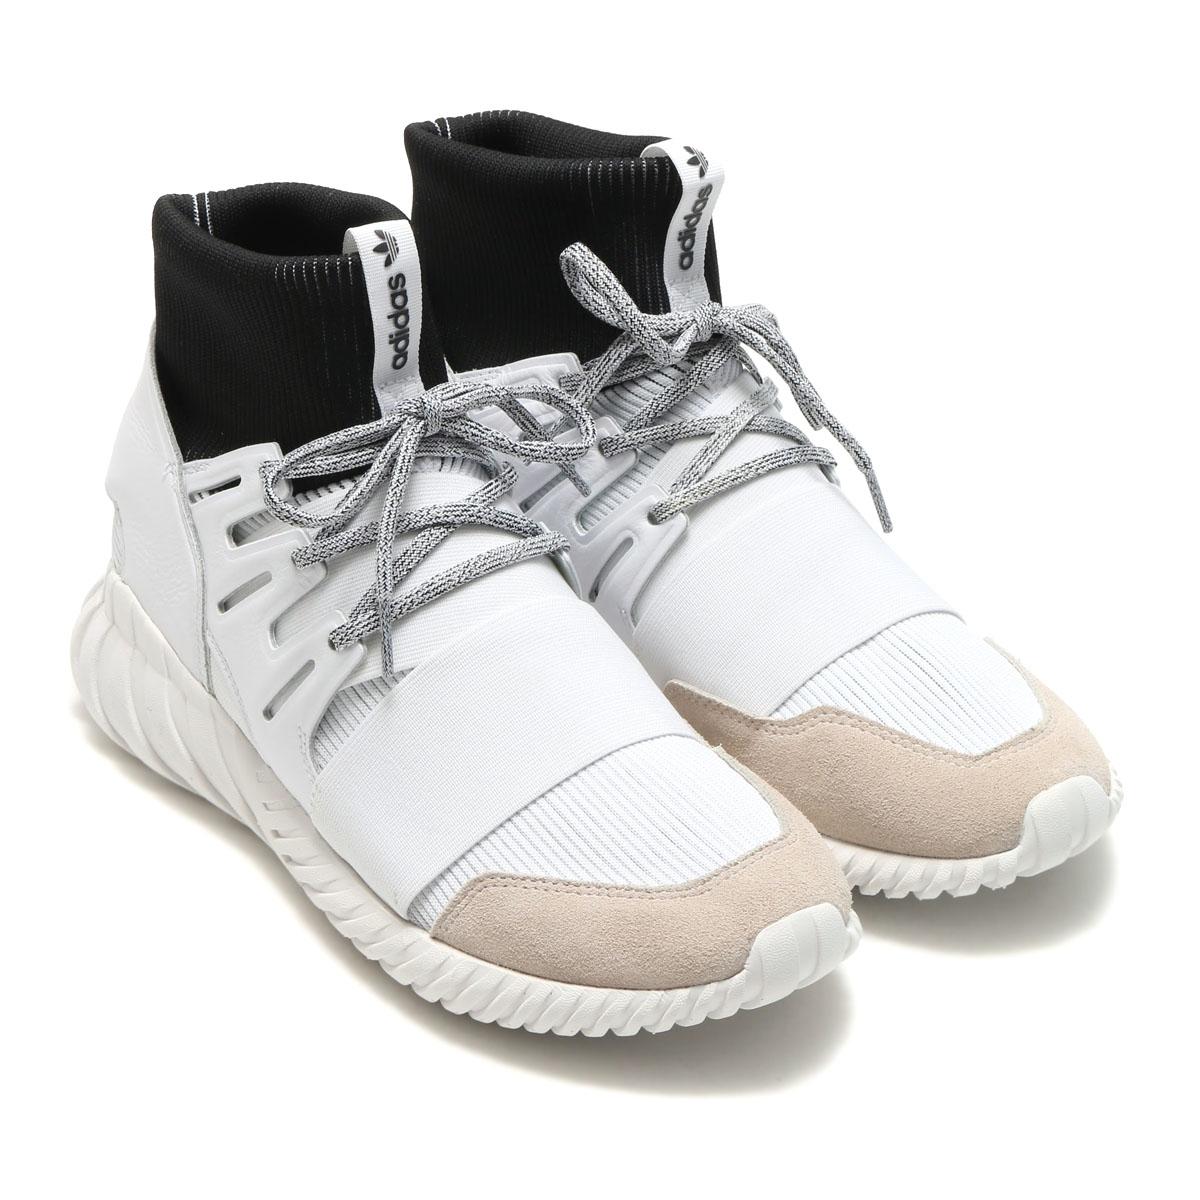 premium selection 16f48 4bab4 adidas TUBULAR DOOM (アディダスチューブラードーム) (RUNNING WHITE) 17FW-I